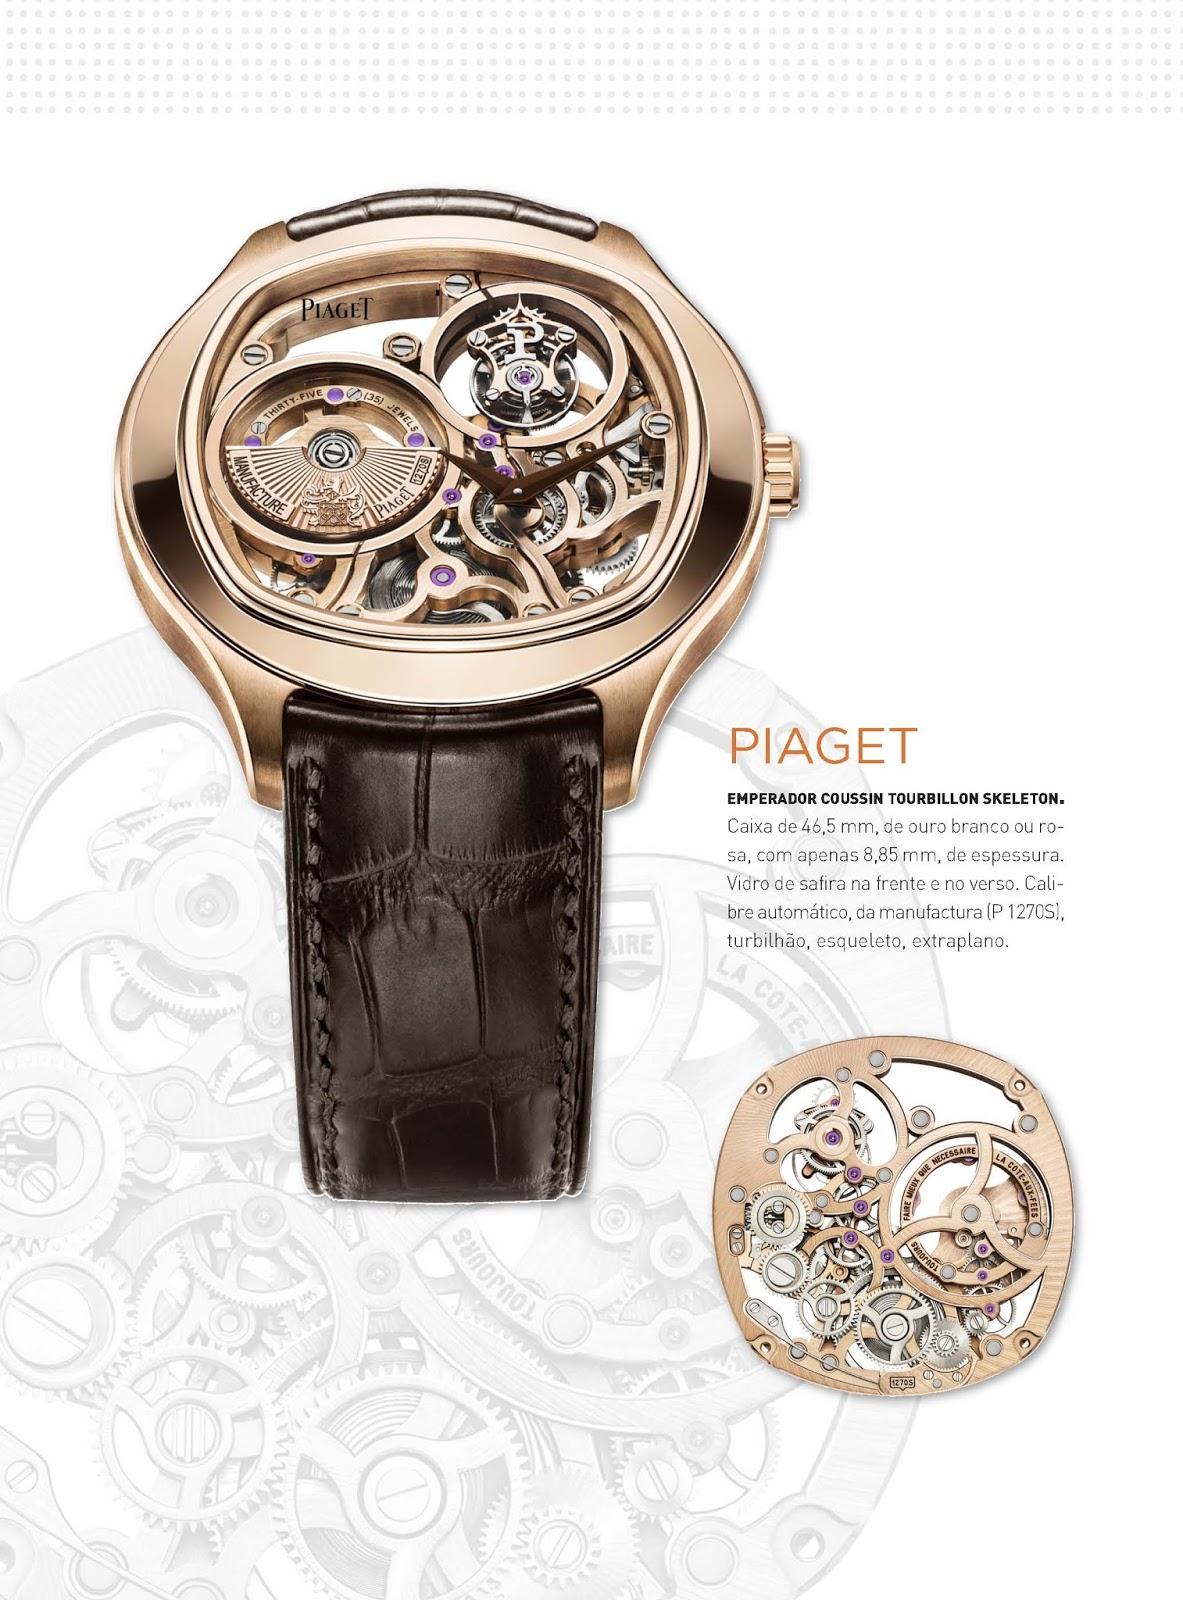 b3dd904943e Relógios   Canetas online - relógio Piaget Emperador Coussin Tourbillon  Skeleton